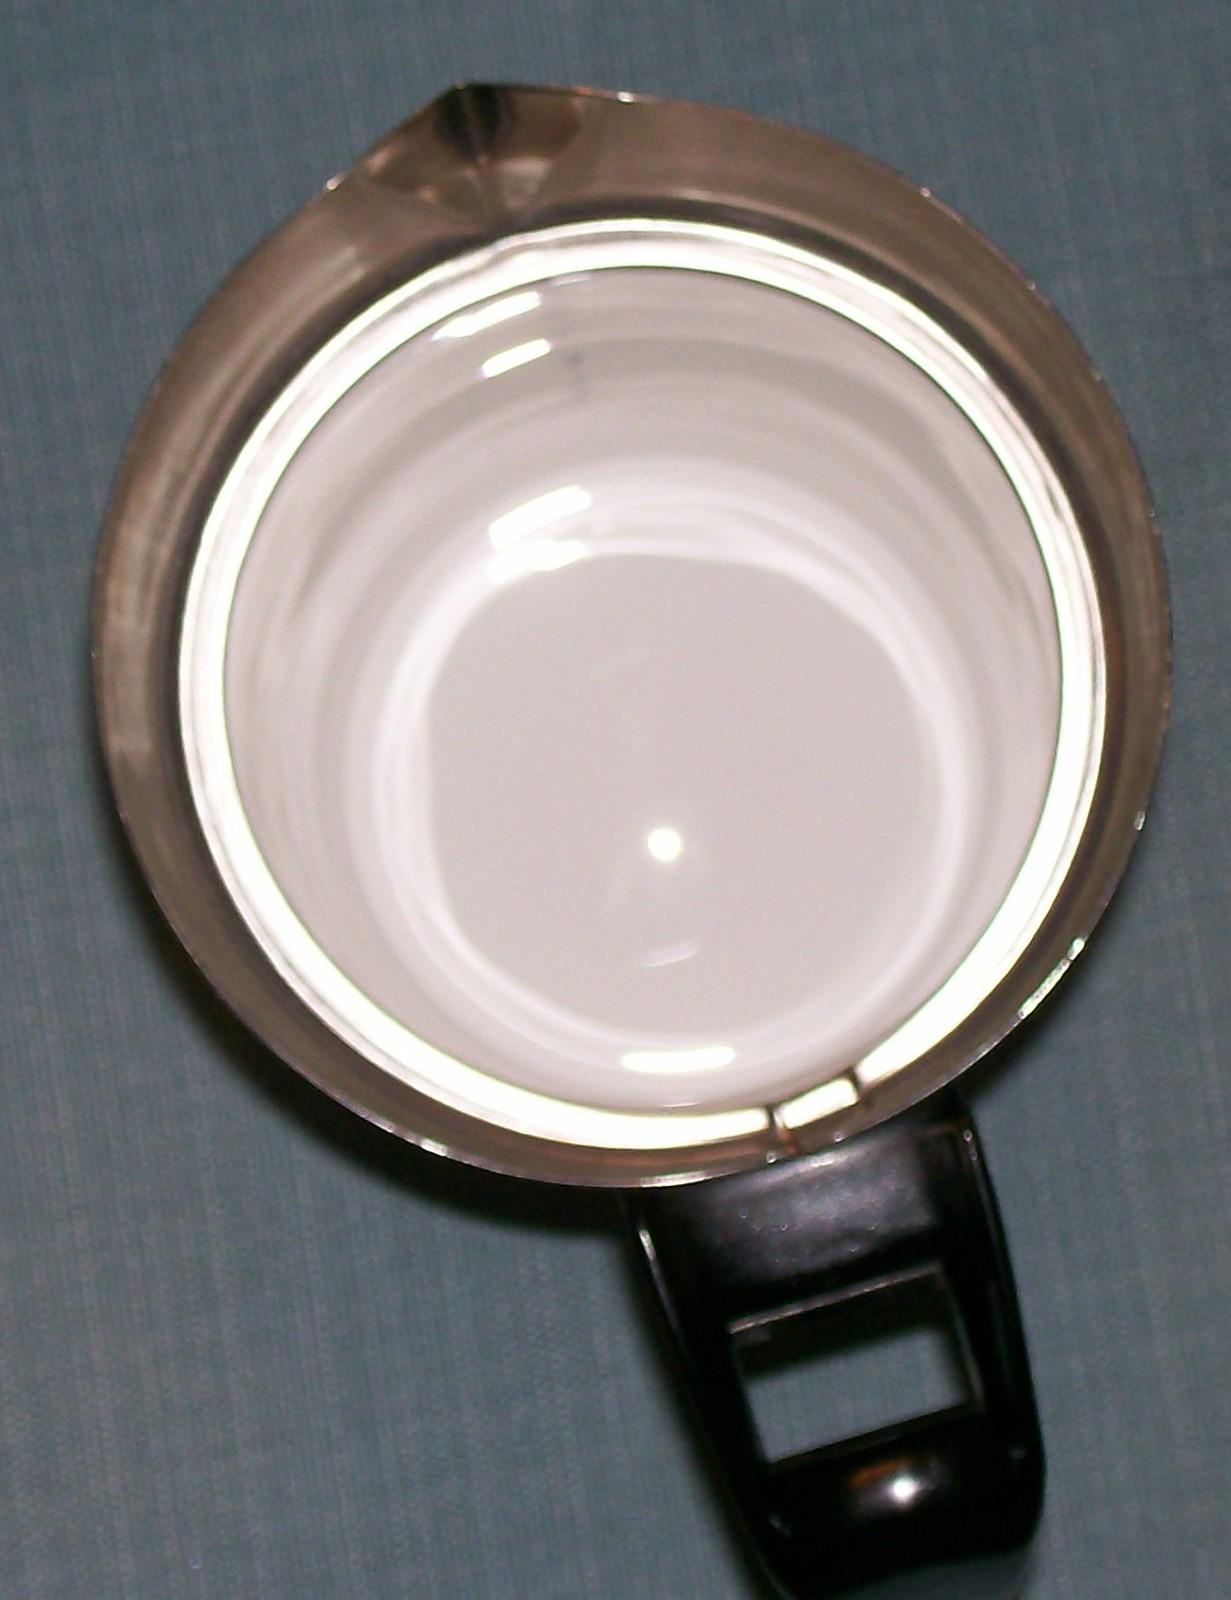 Corning Ware BLUE CORNFLOWER Electric Coffee Pot/Percolator 6 cup P-6-EP VGVC  image 8